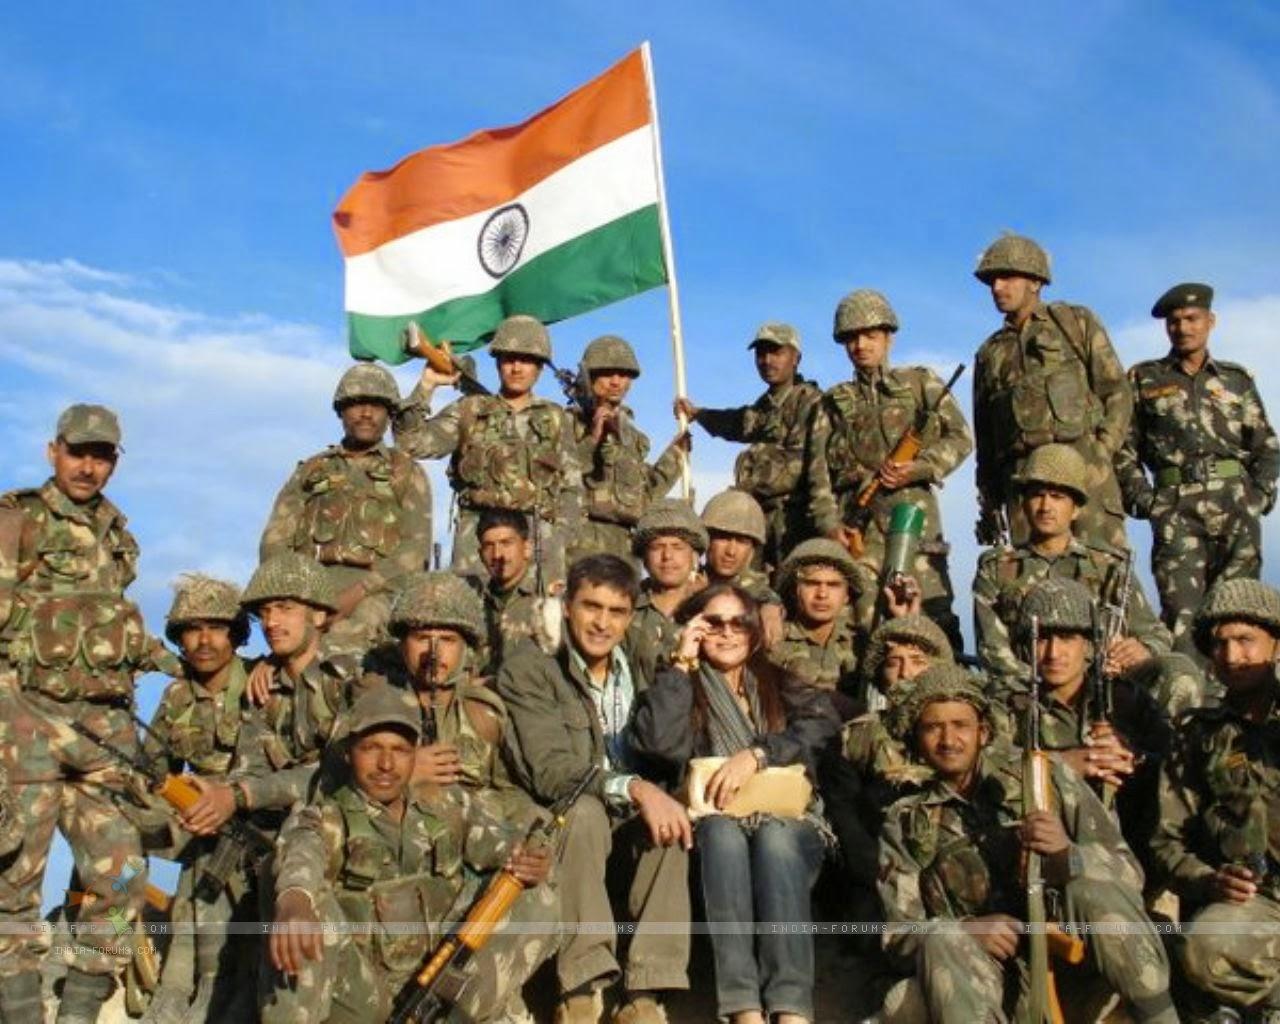 Hd wallpaper indian army - All Best Hd Walpaper